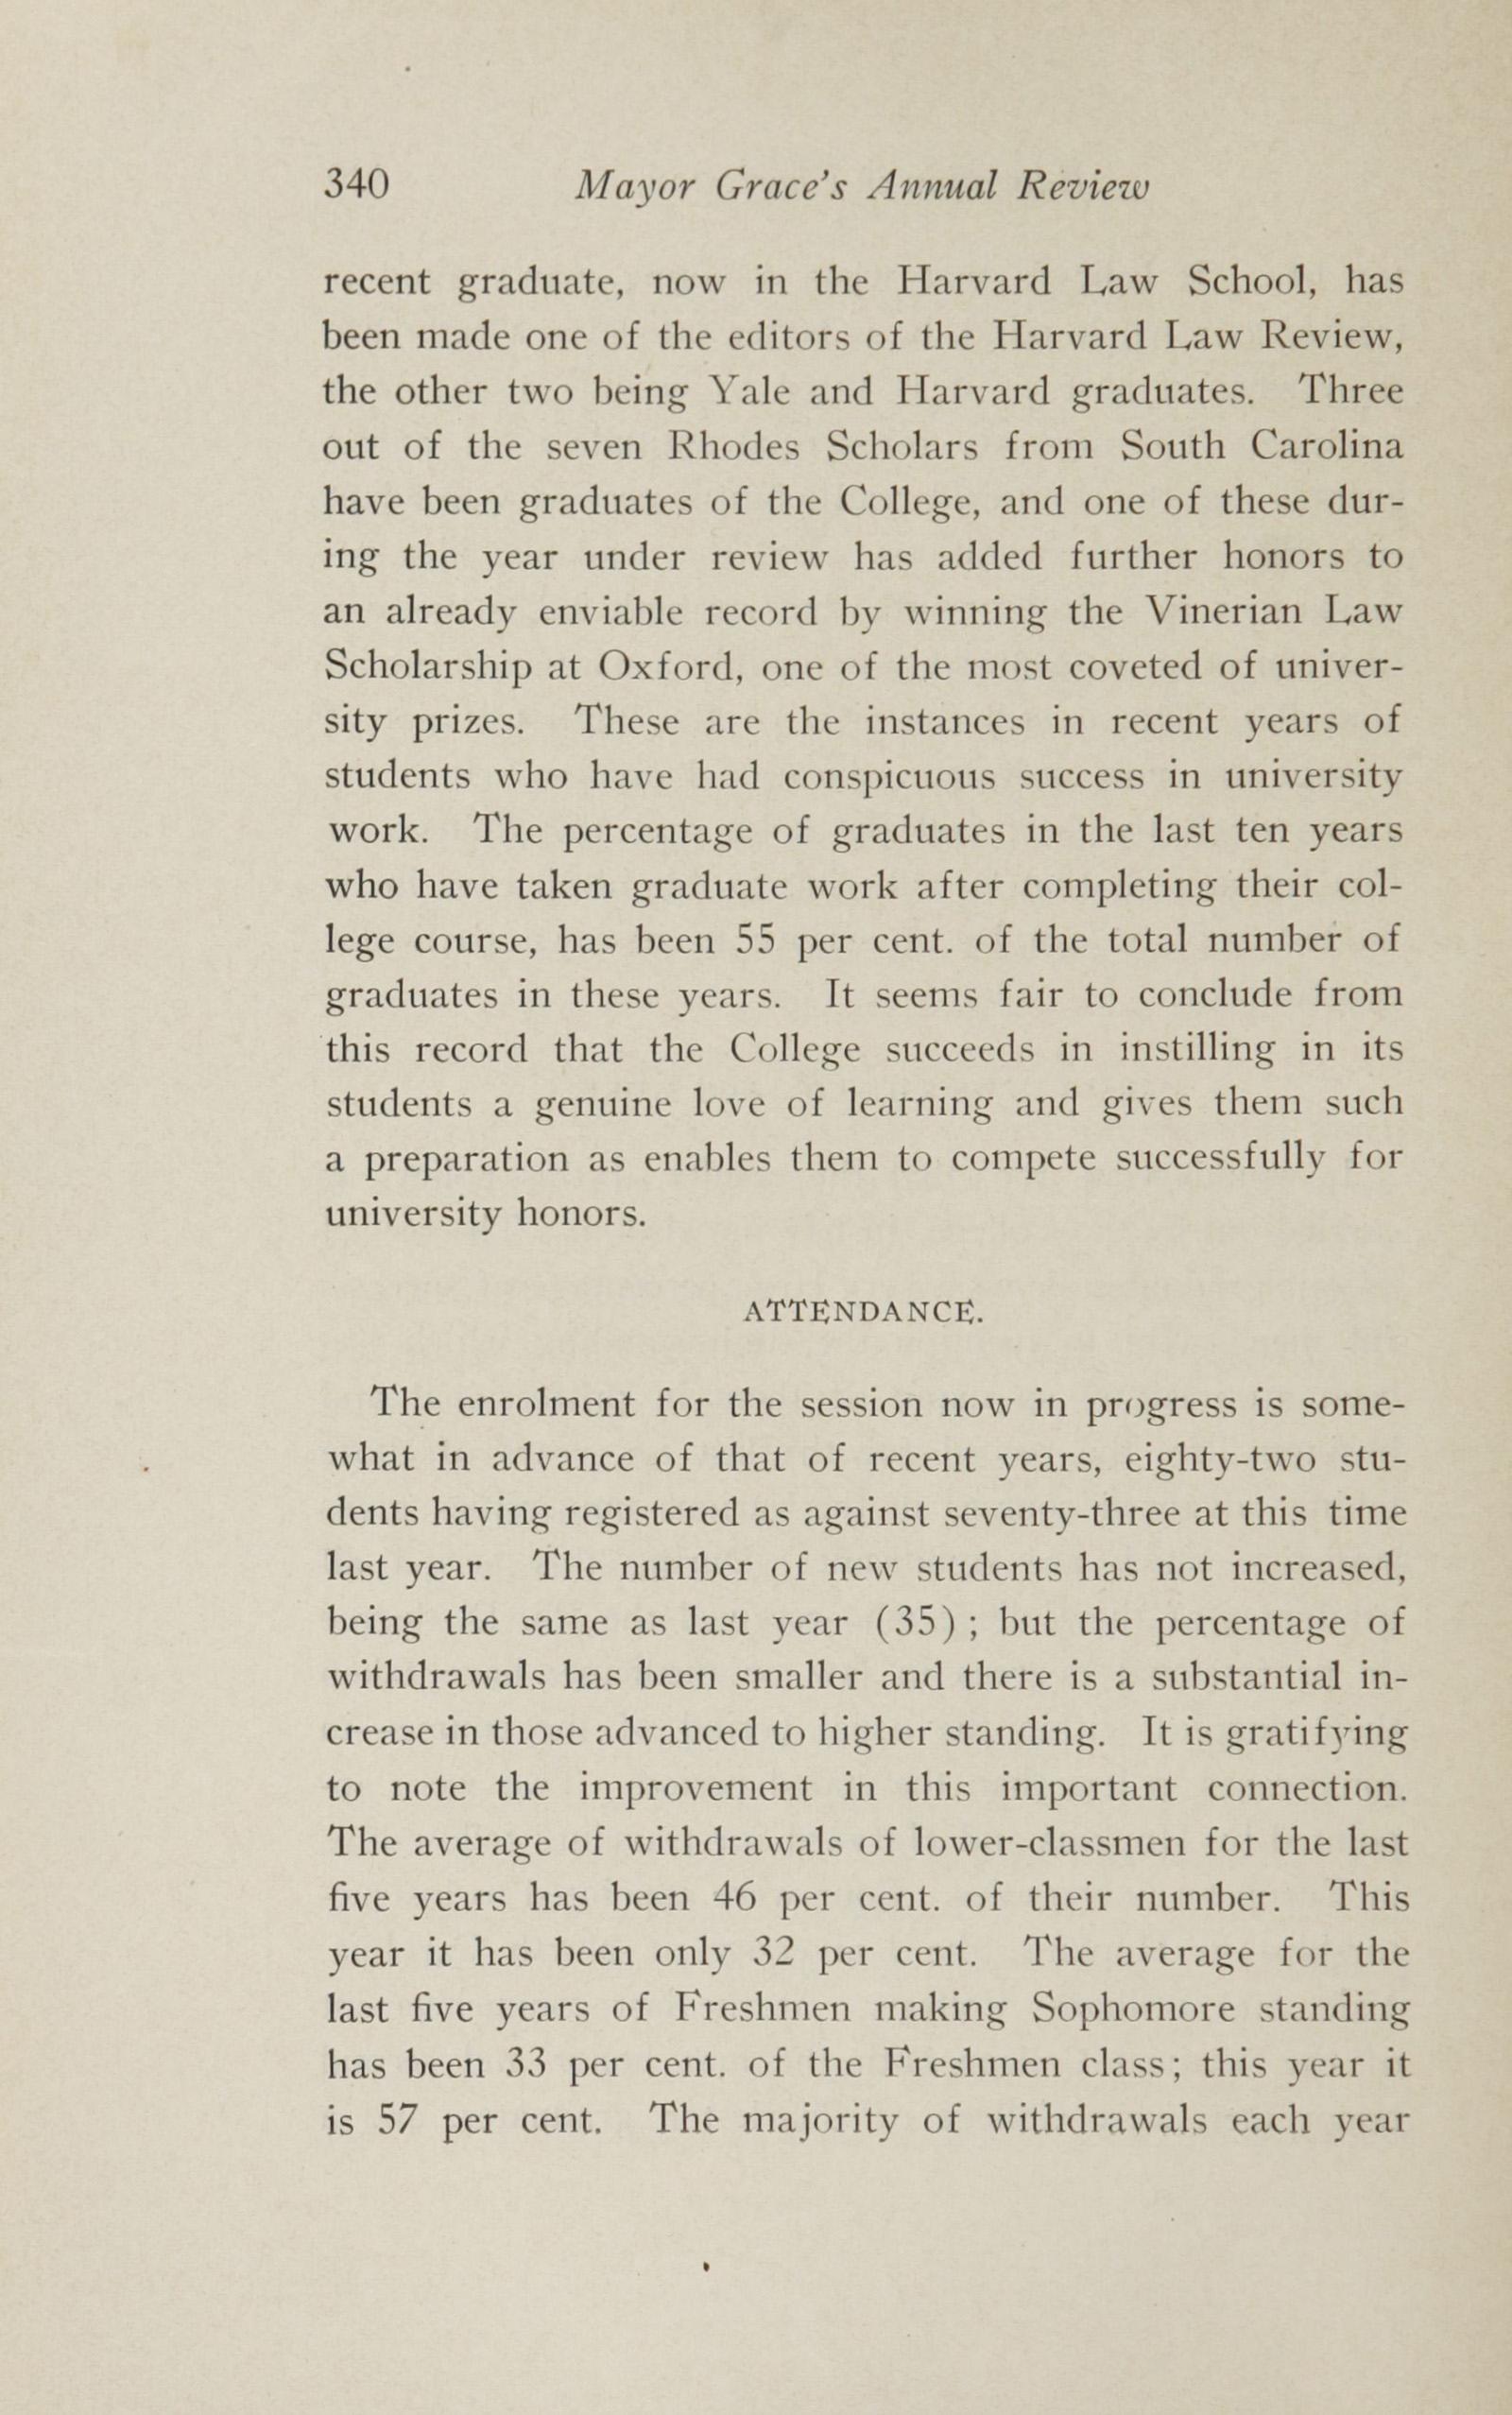 Charleston Yearbook, 1913, page 340